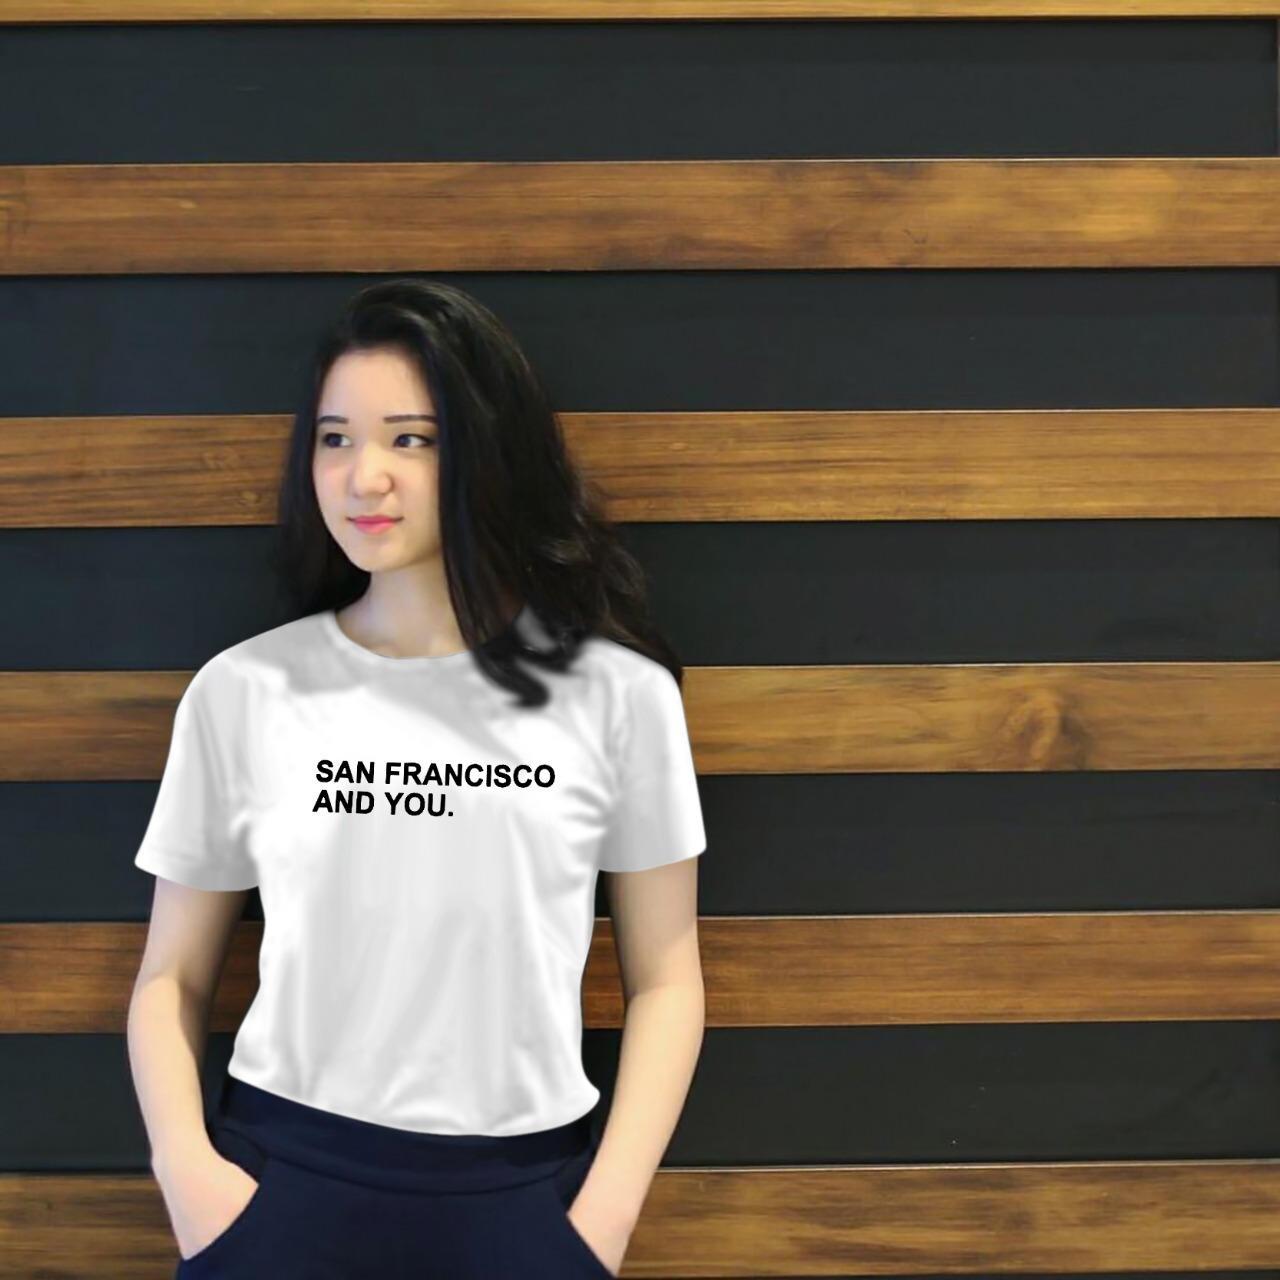 7629bf17 Xavier Kaos Wanita tee SAN FRANSISCO / T-shirt Distro Wanita / Baju Atasan  Kaos